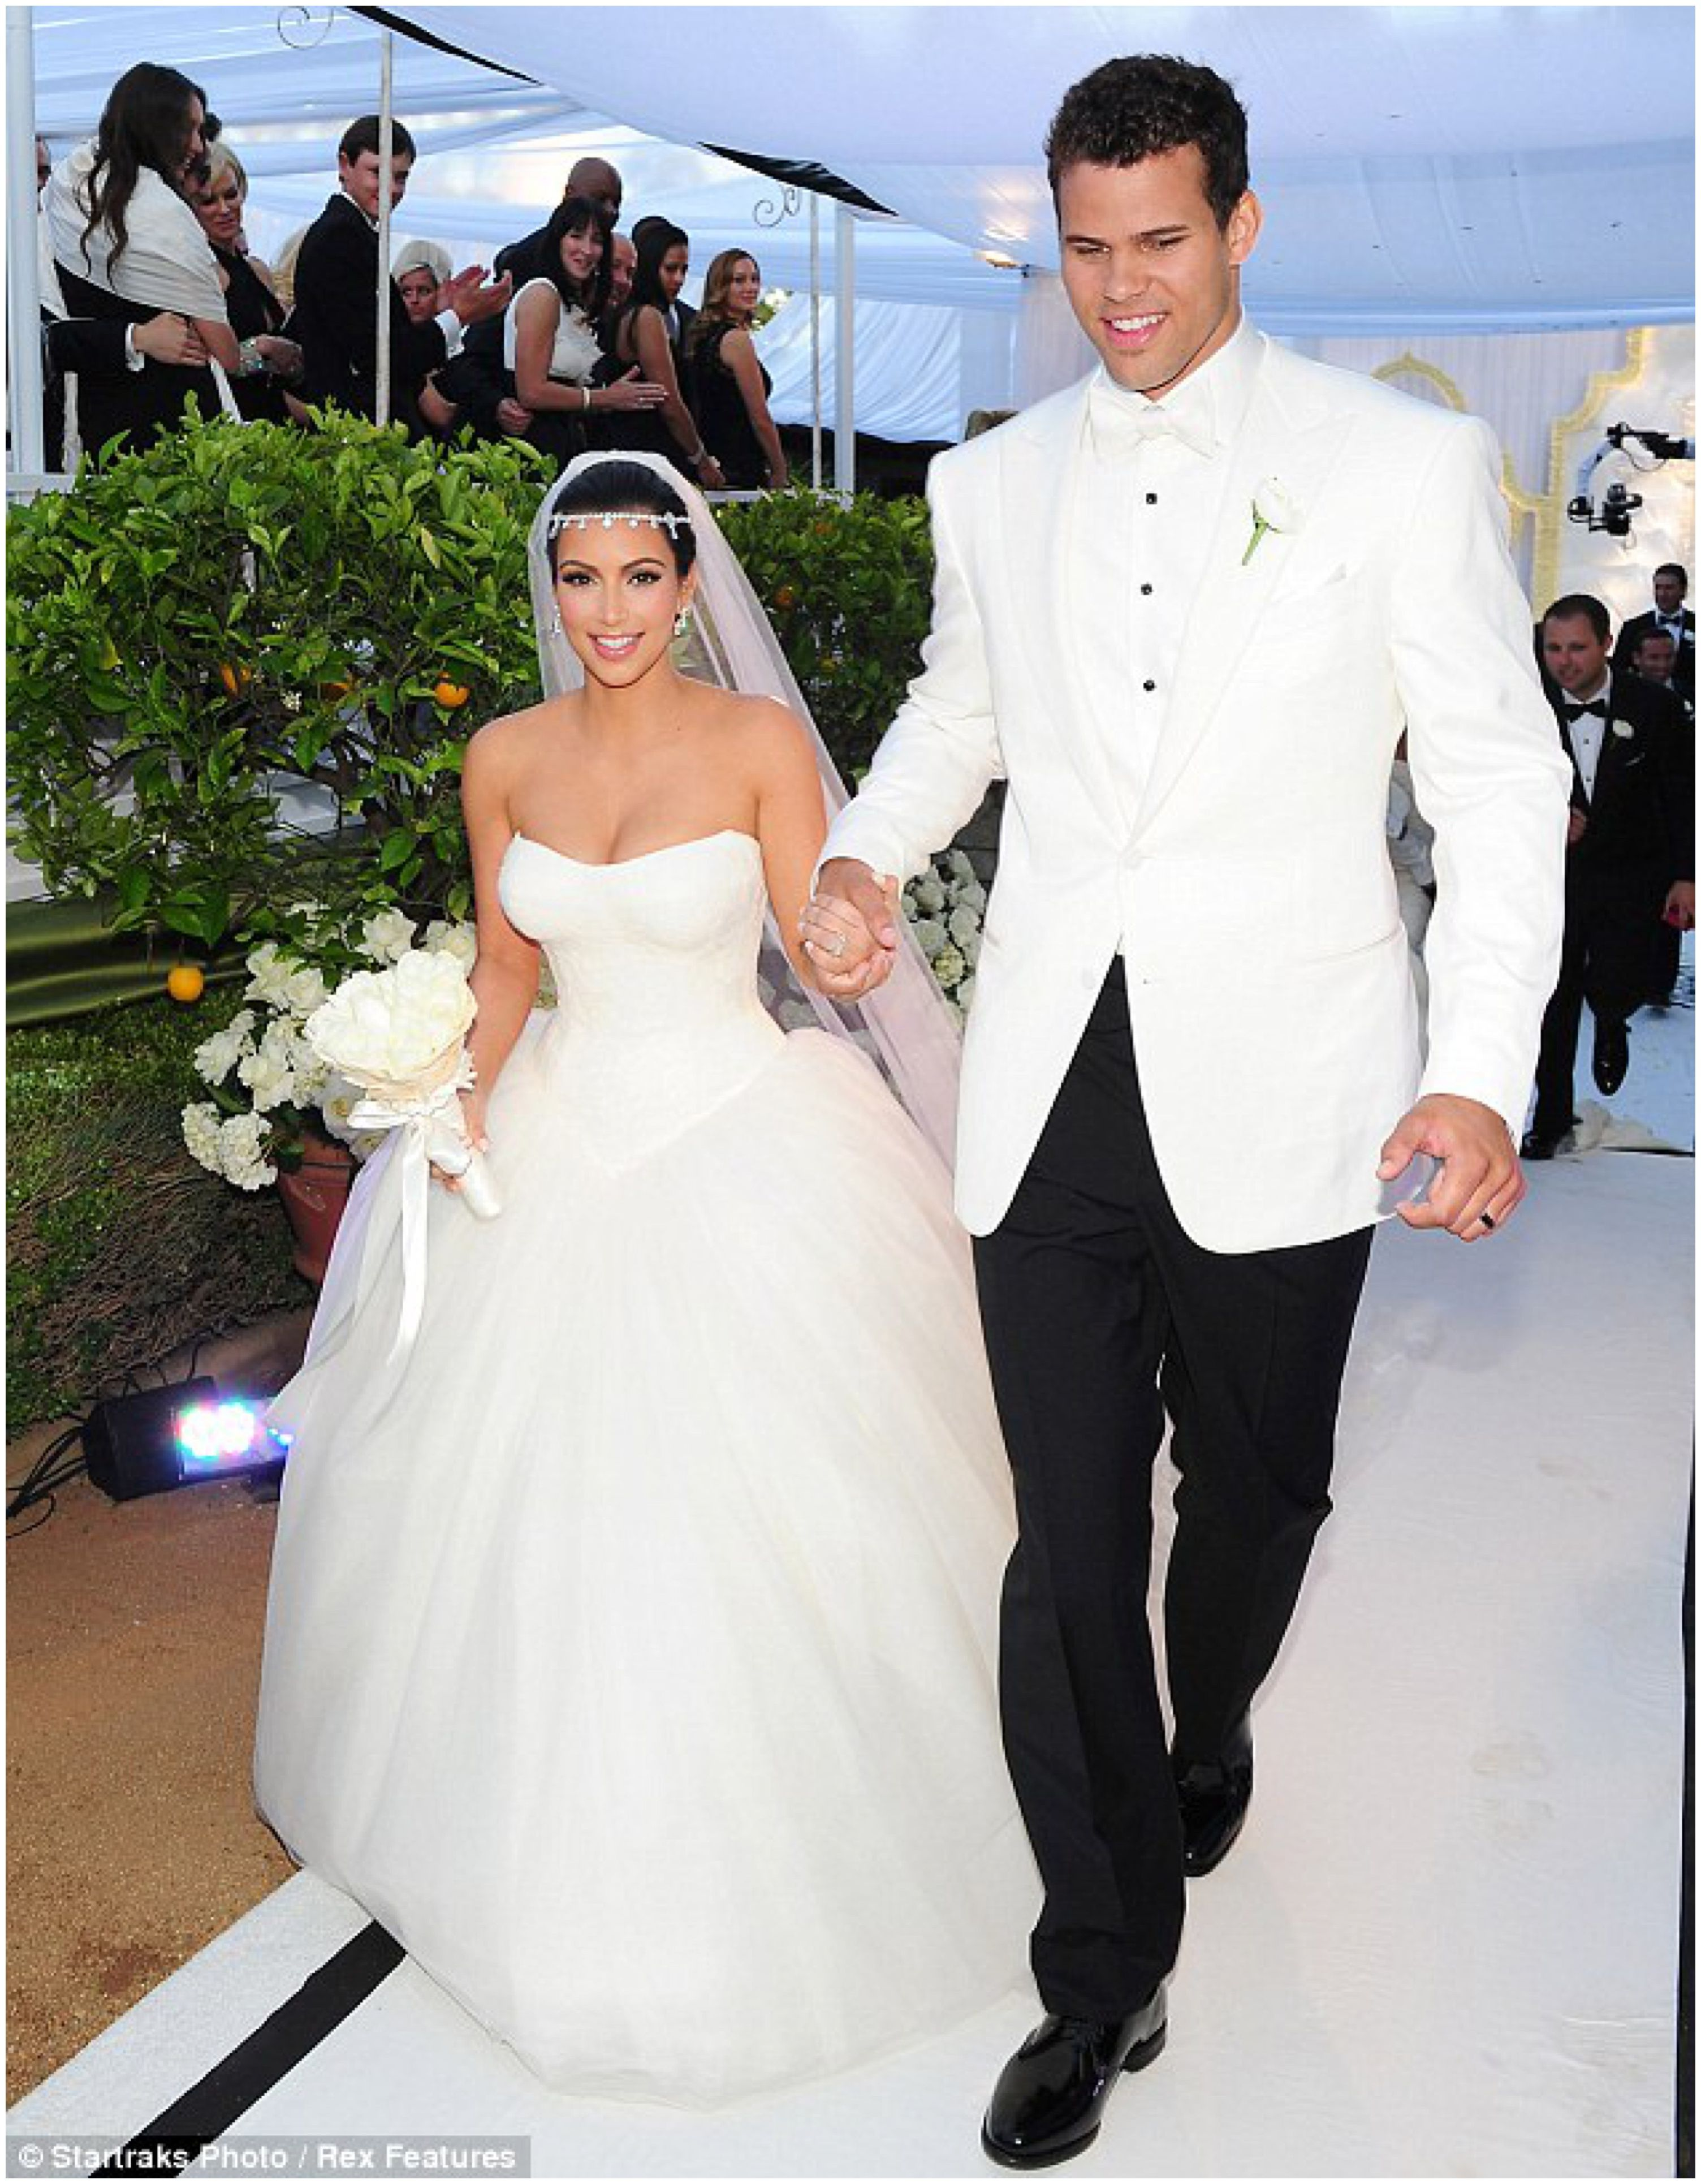 Wedding News Kim Kardashian S Wedding Dresses Kim Kardashian And Kris Humphries Wedding Kim Kardashian Wedding Dress Kim Kardashian Wedding Kardashian Wedding [ 3861 x 3008 Pixel ]